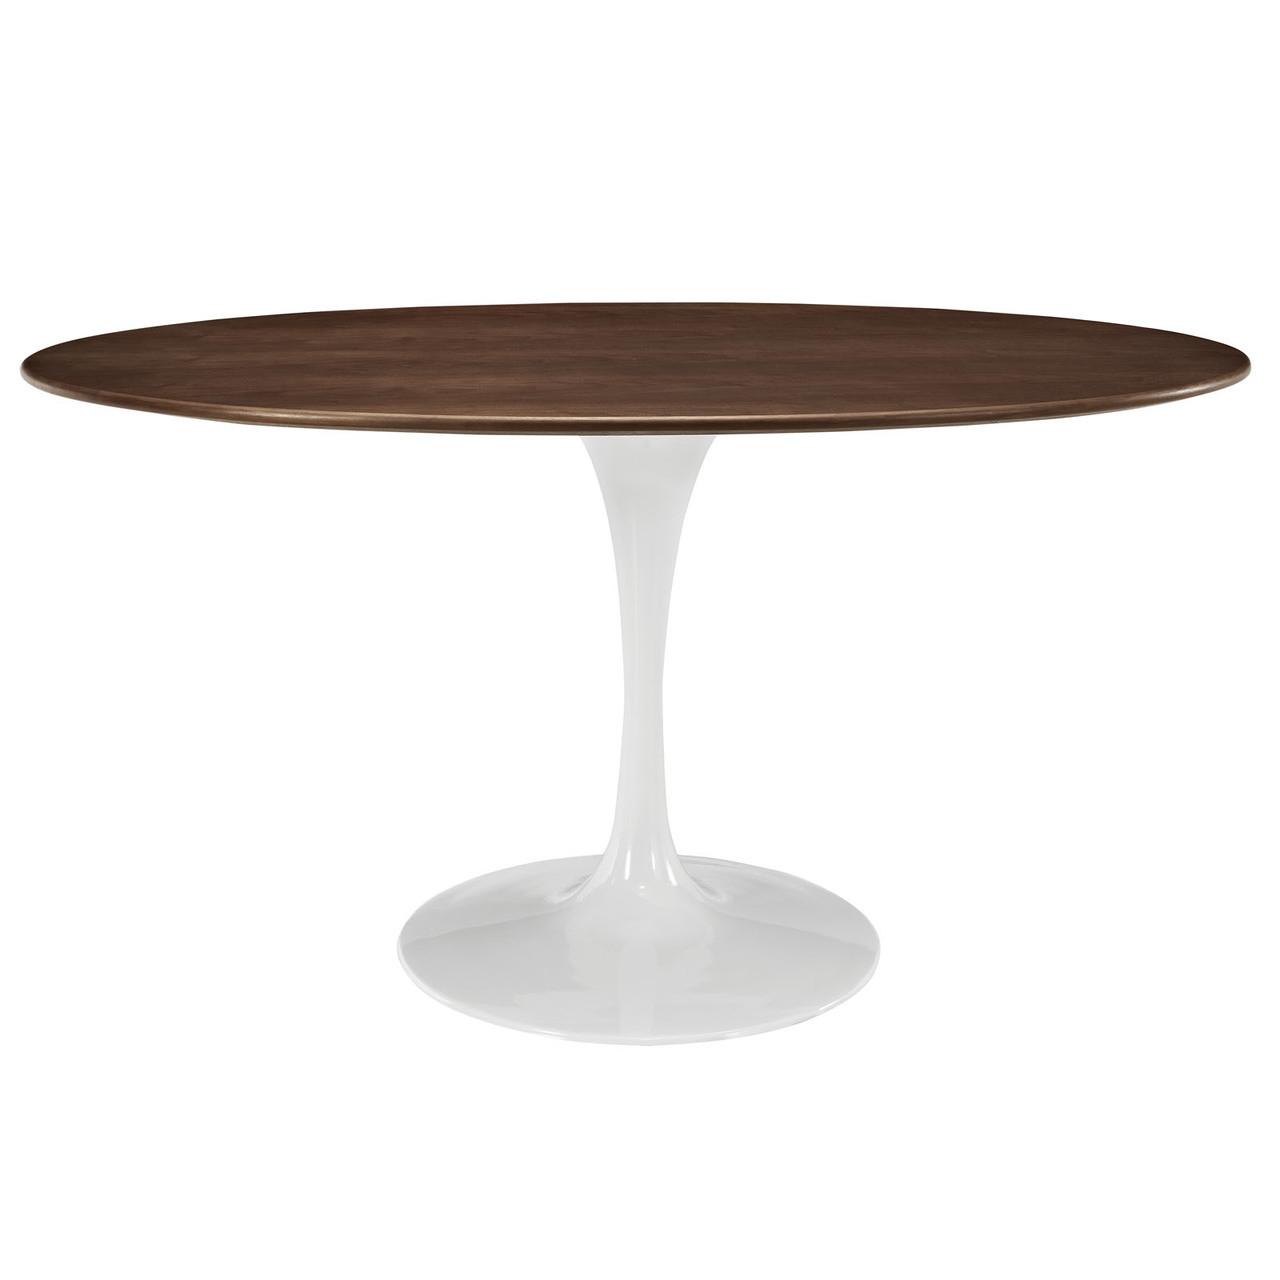 "Lippa 60"" Oval Walnut Dining Table"